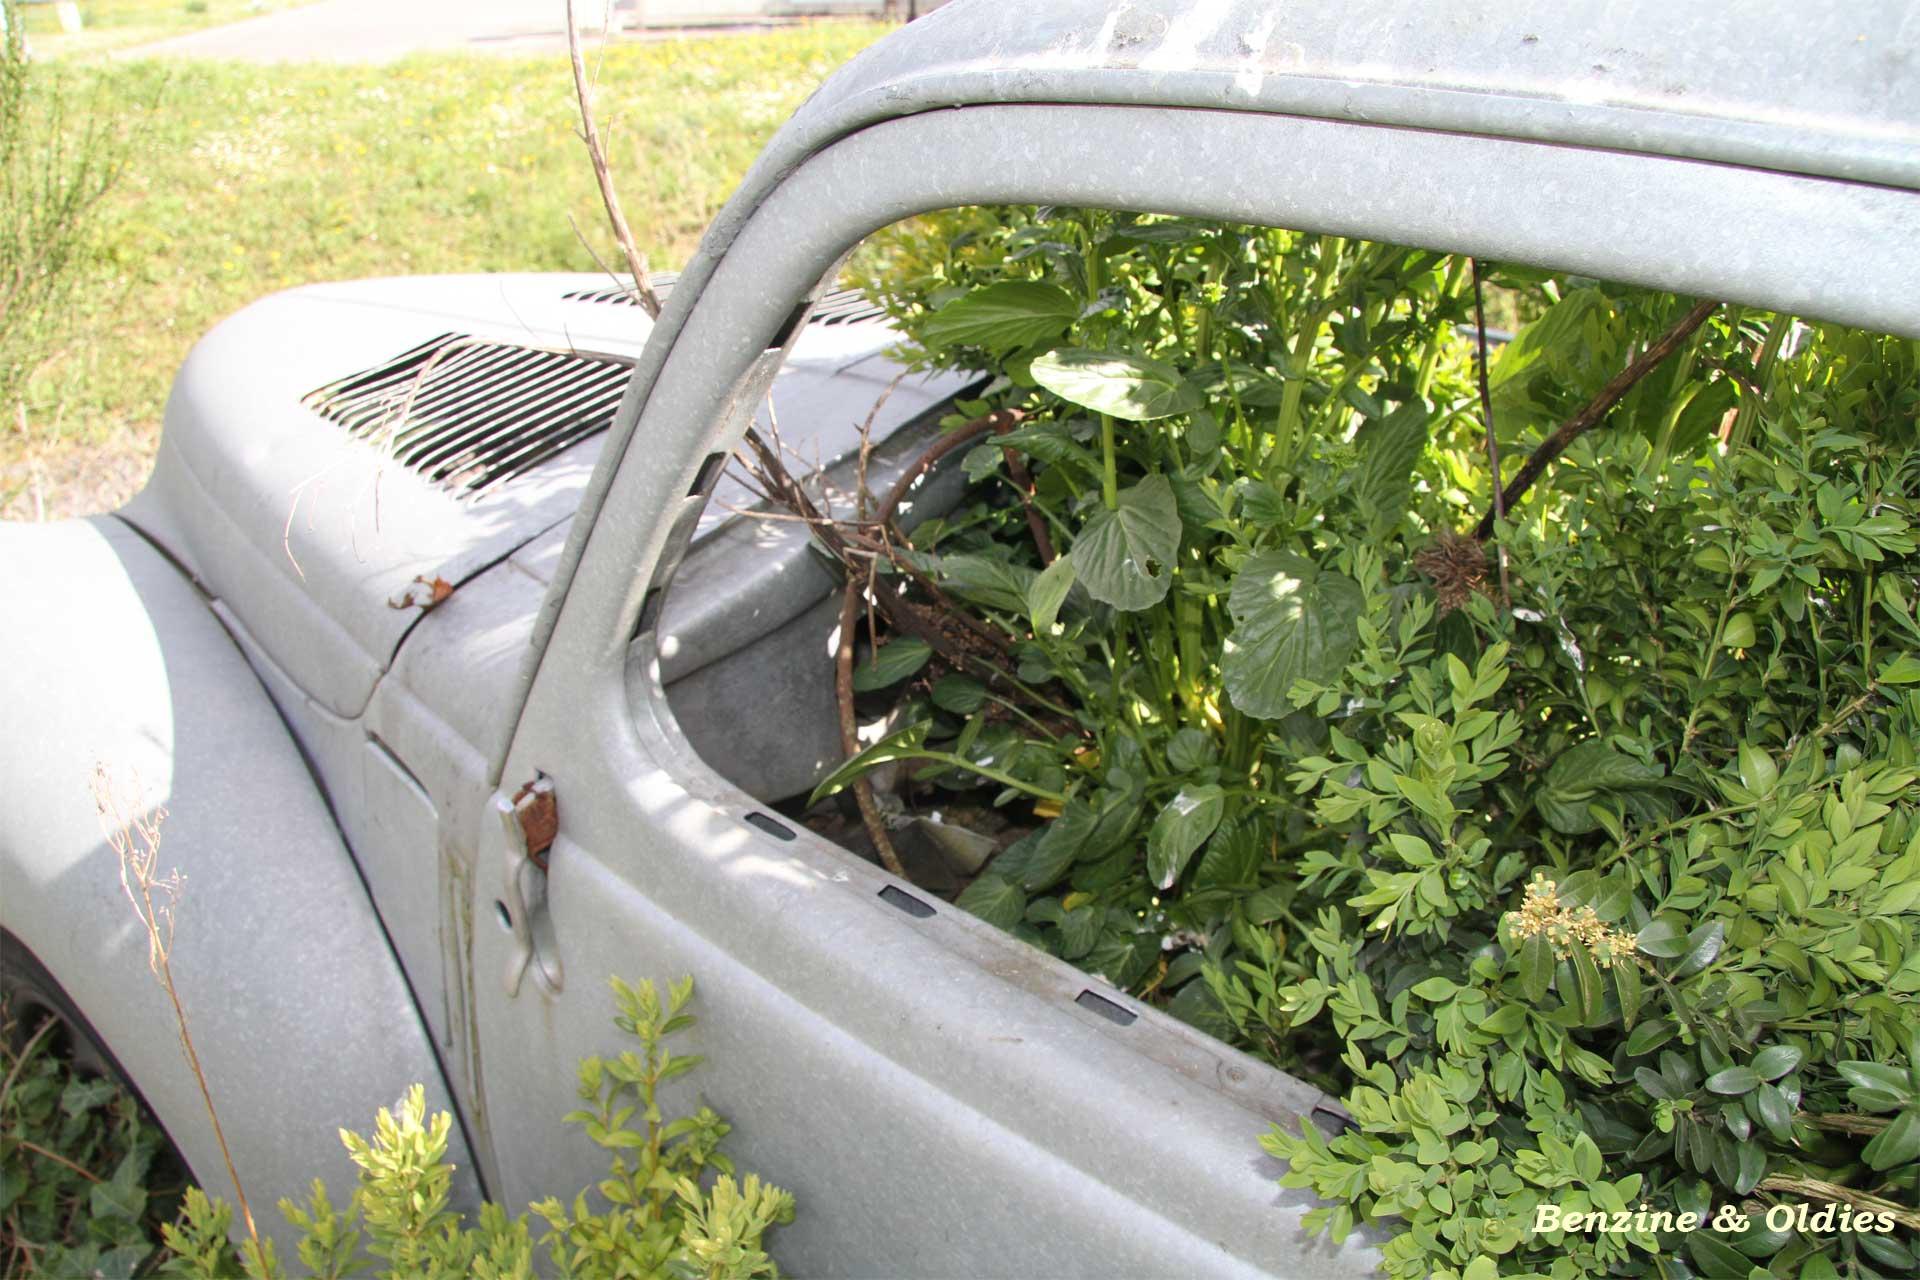 une Simca 6 carrosserie aluminium oubliée dans la nature - Simca6 - Page 2 338440simca6street37w19201280